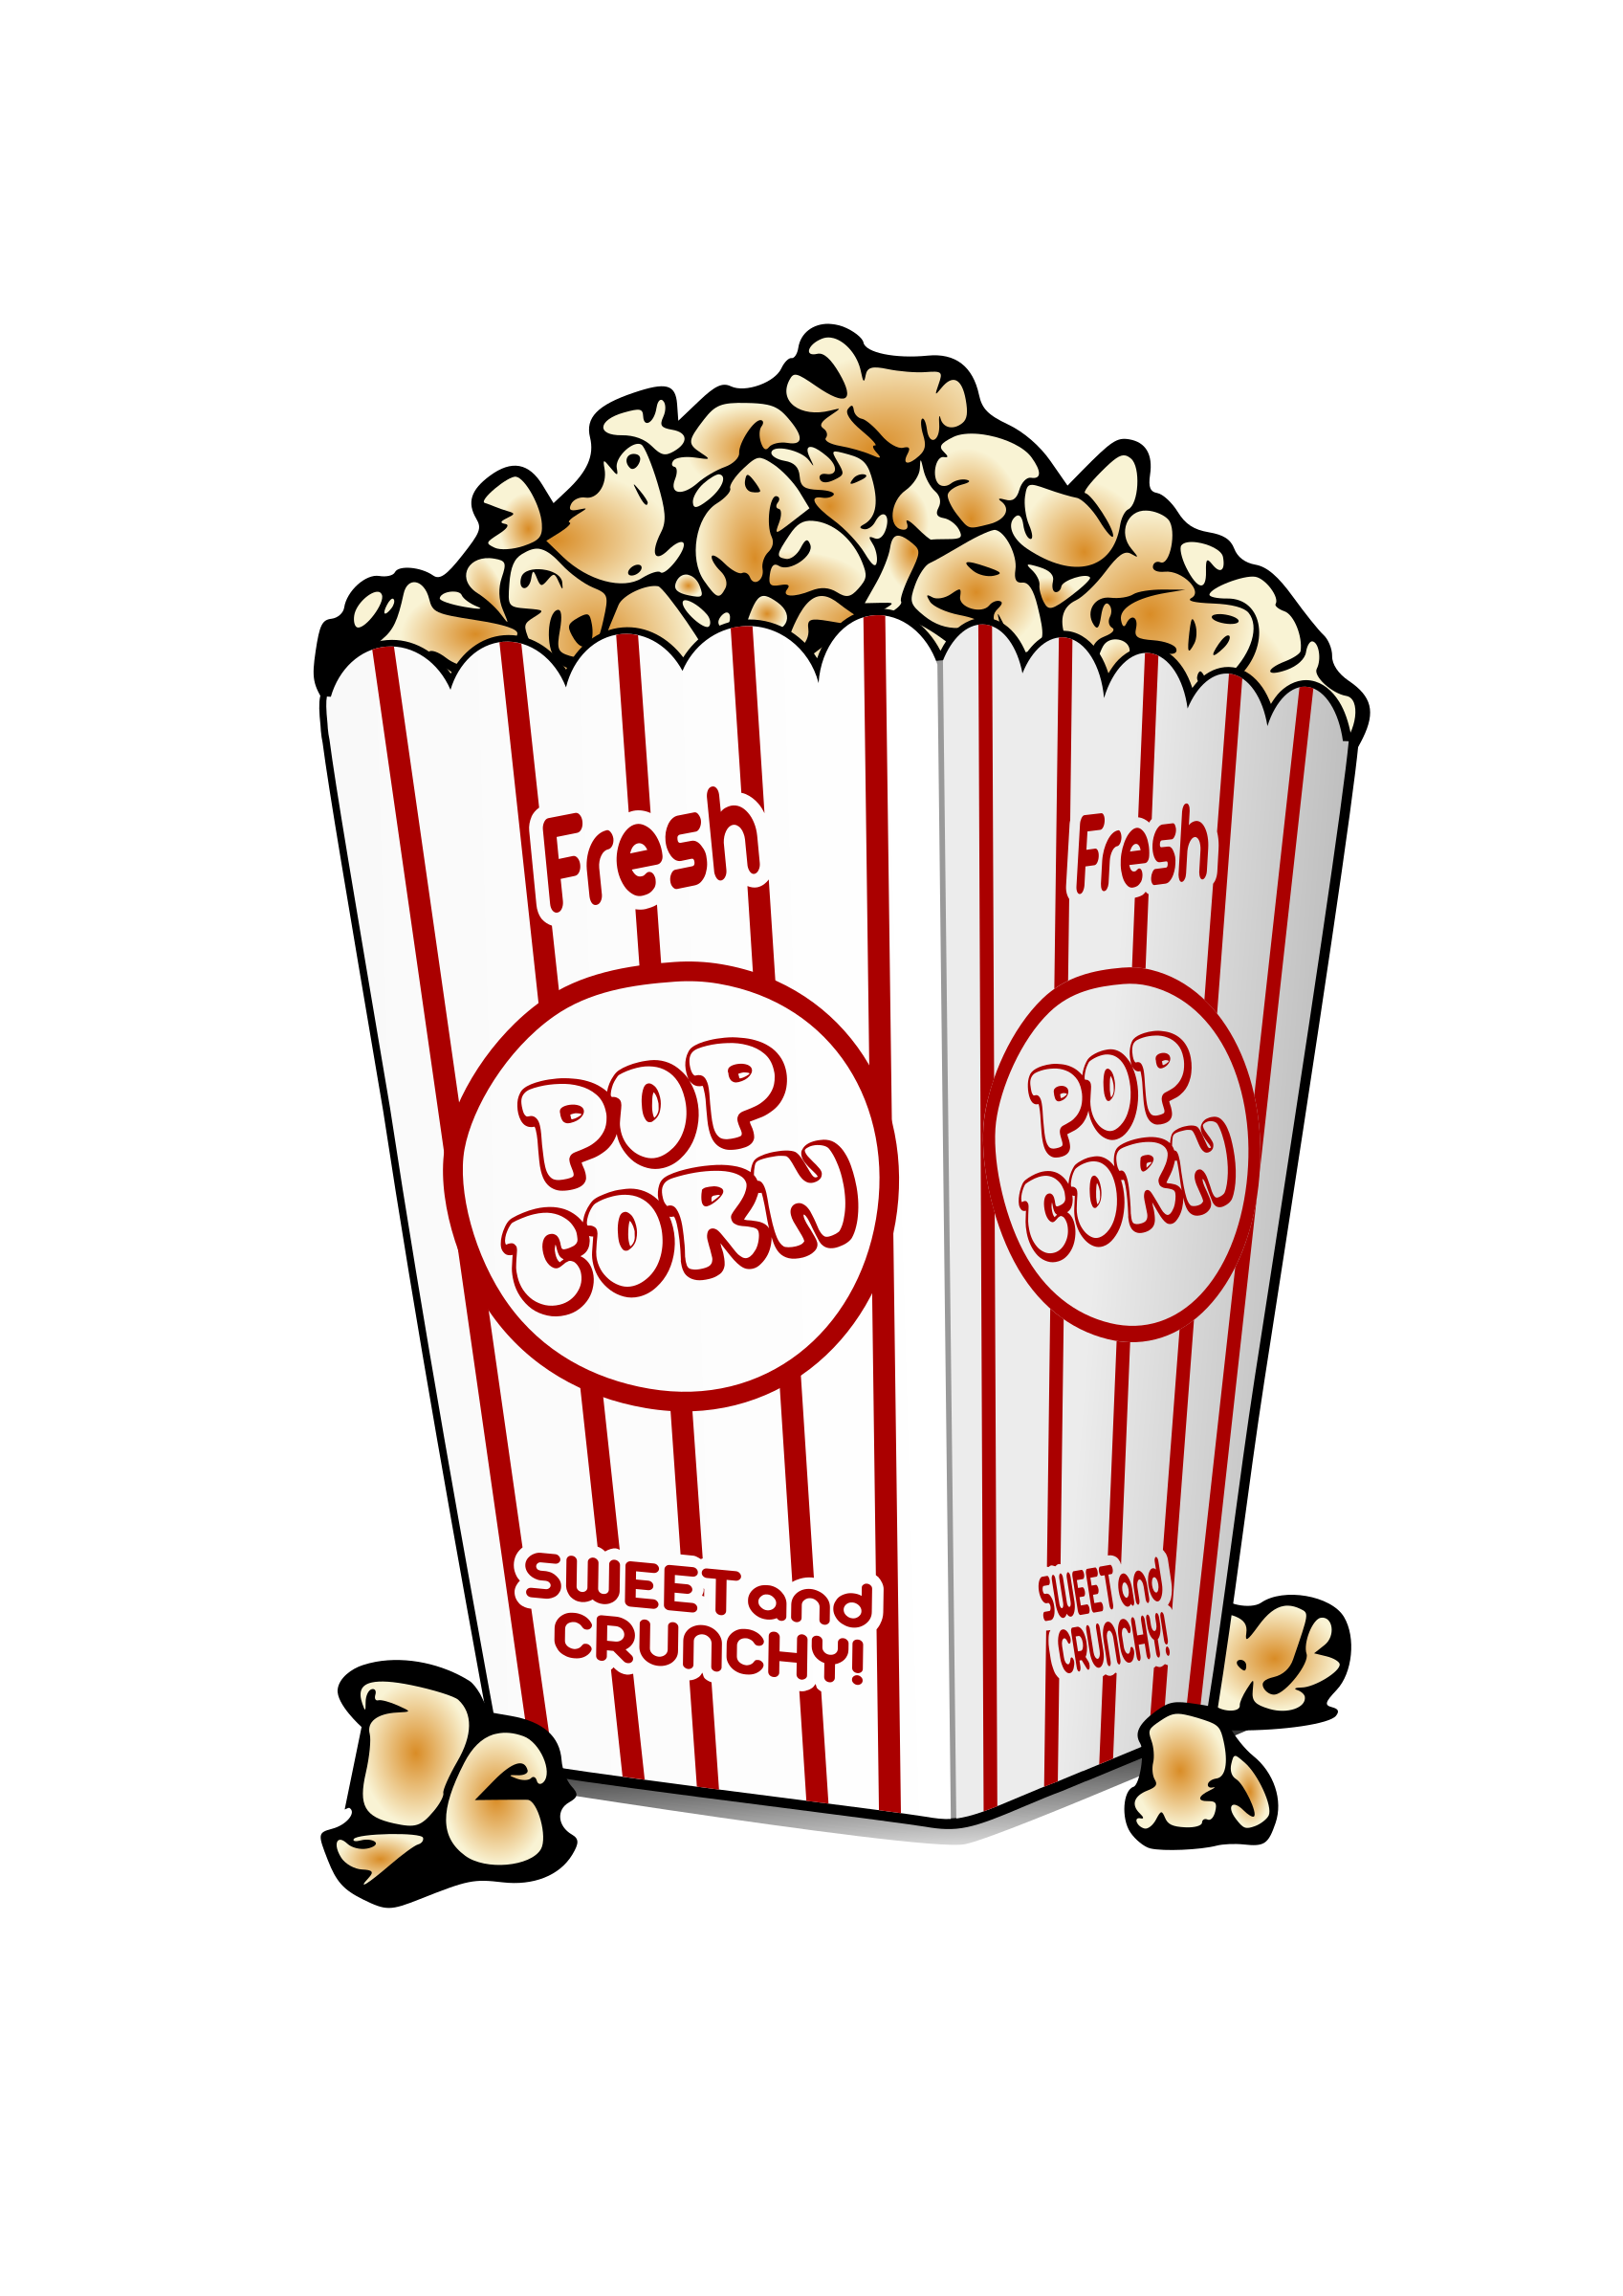 png freeuse Big image png. Popcorn clipart.